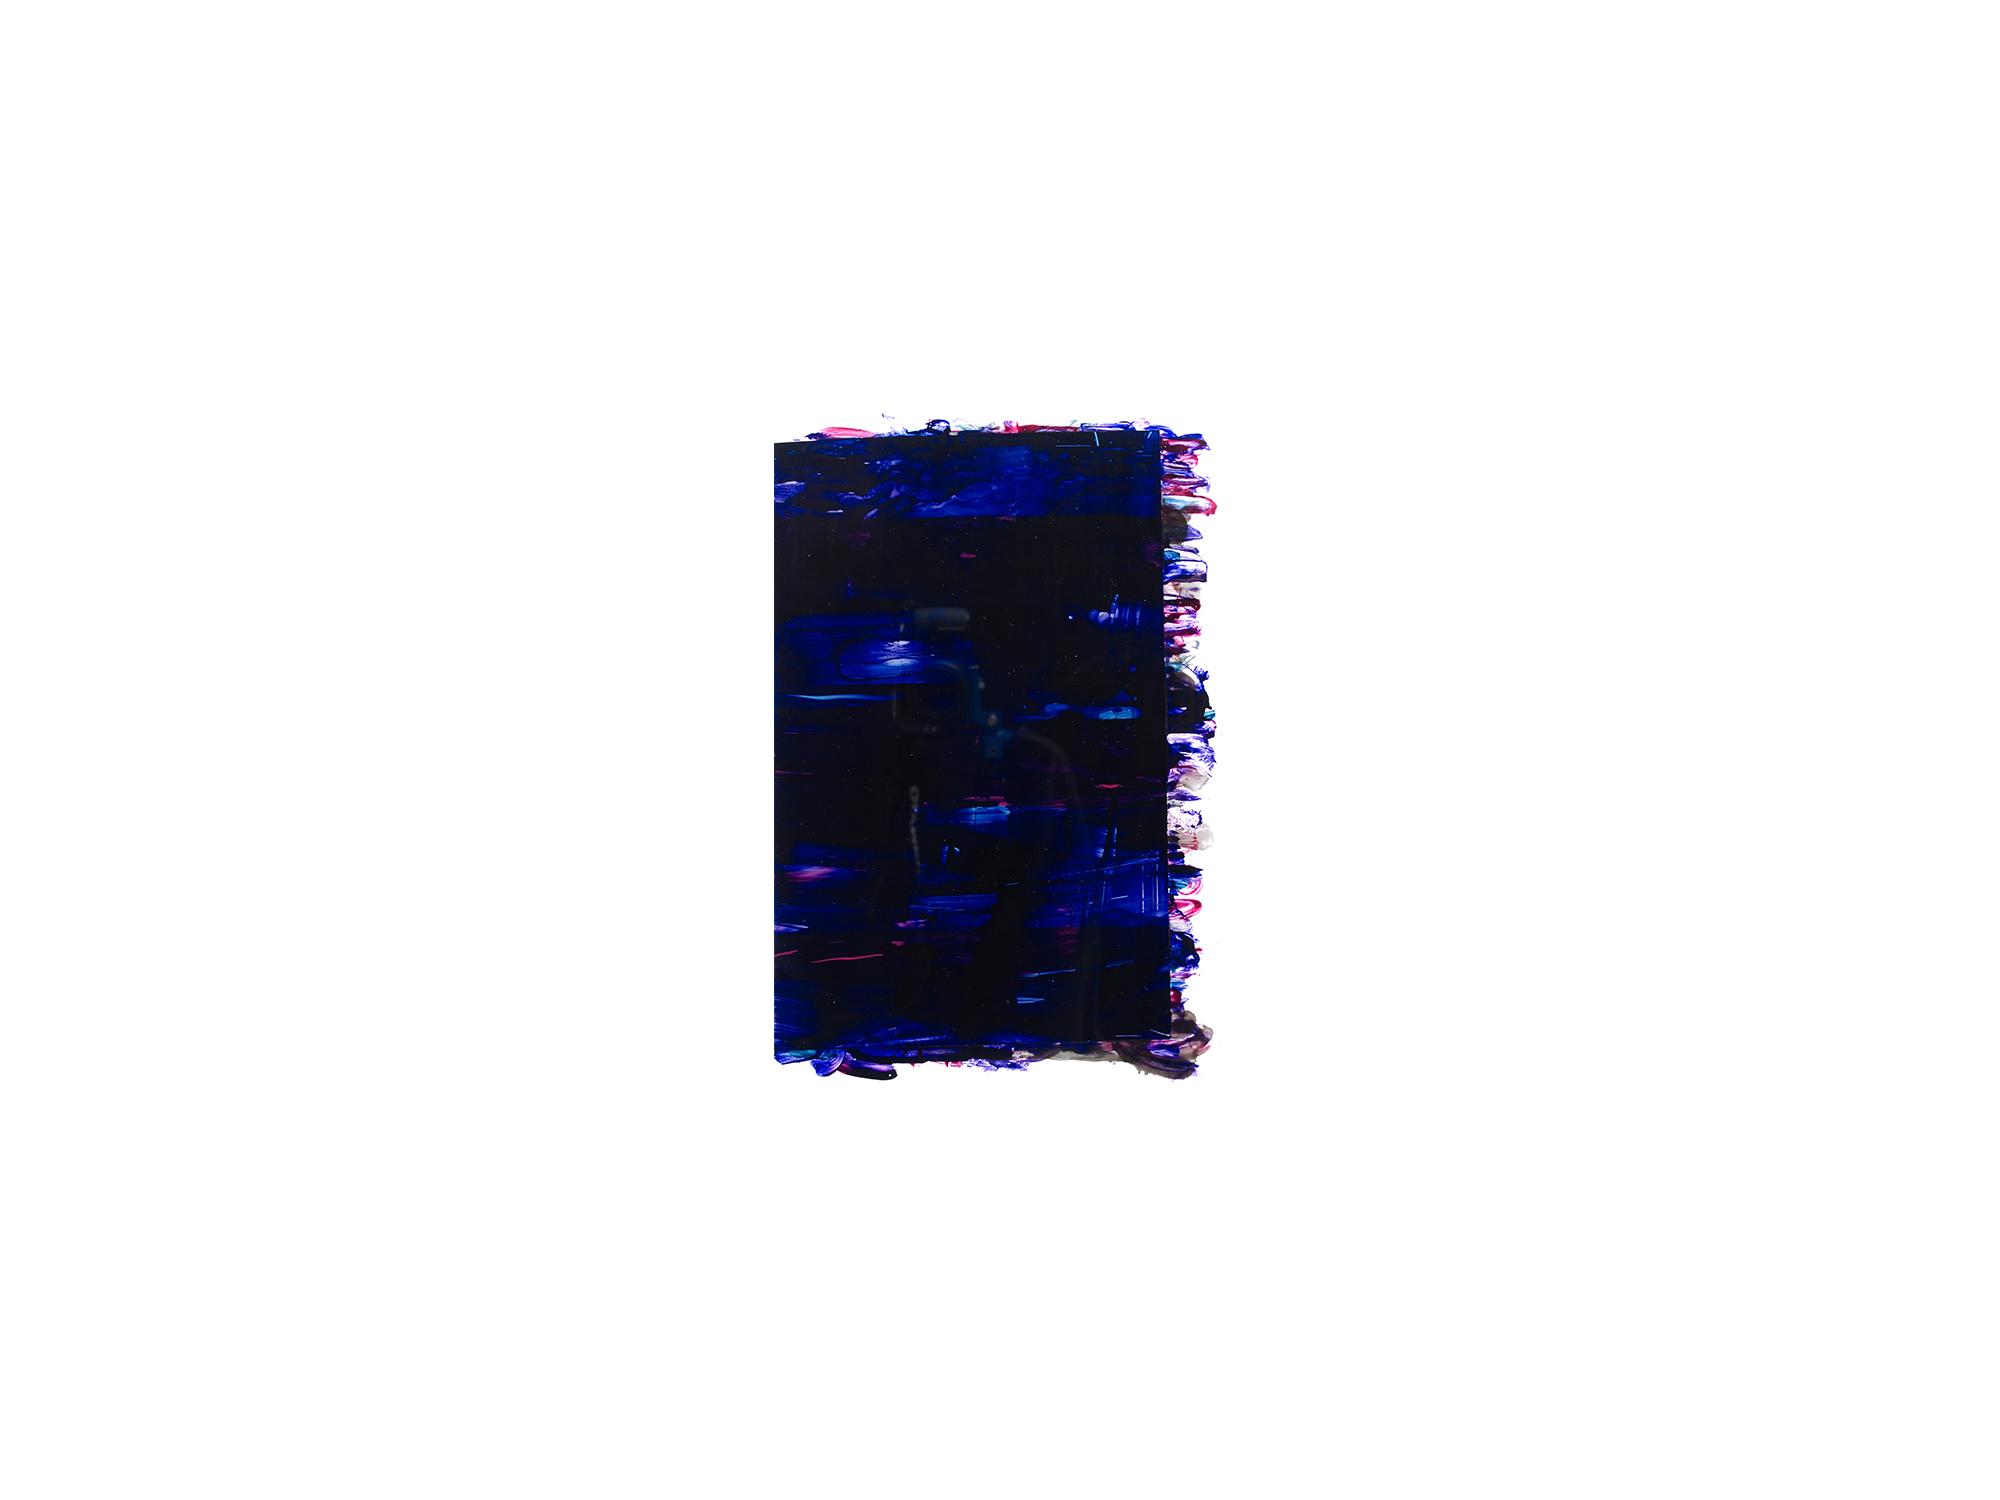 Michael Jäger   Bells #33 , 2014 acrylglas, oil, acrylic and lacquer on Dibond 39 x 26 cm